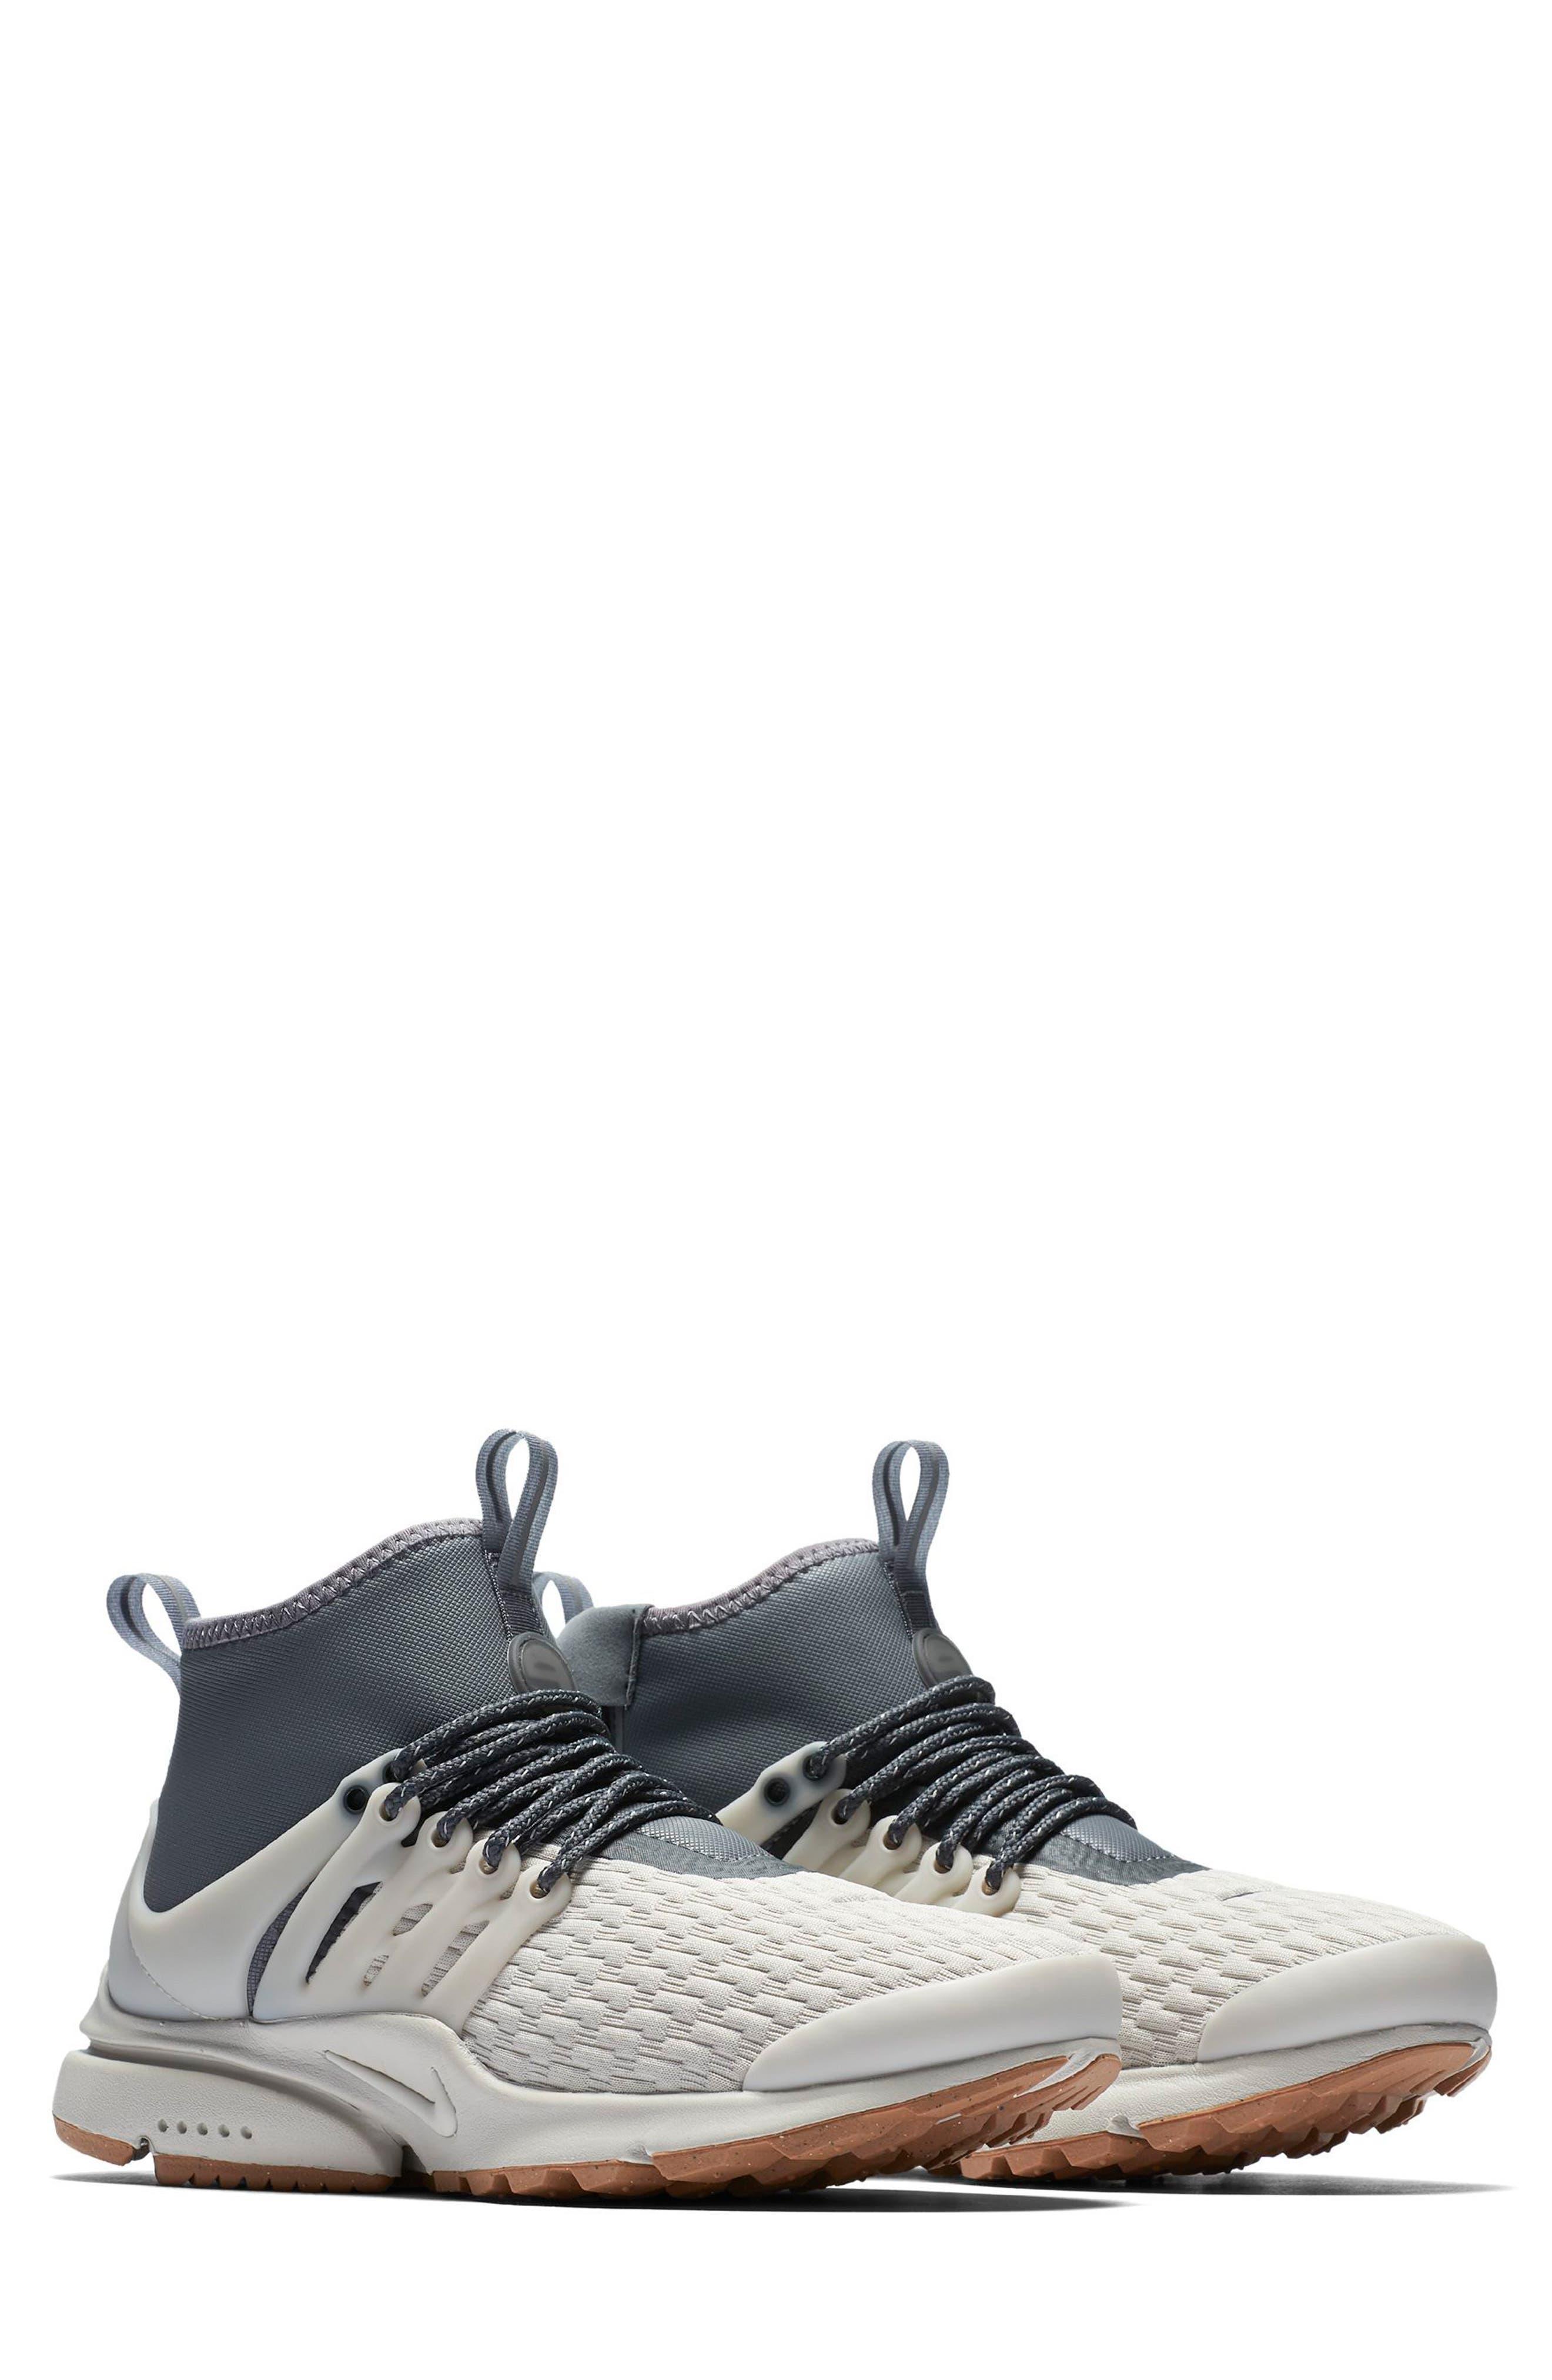 Nike Air Presto Mid Utility Water Repellent Sneaker (Women)